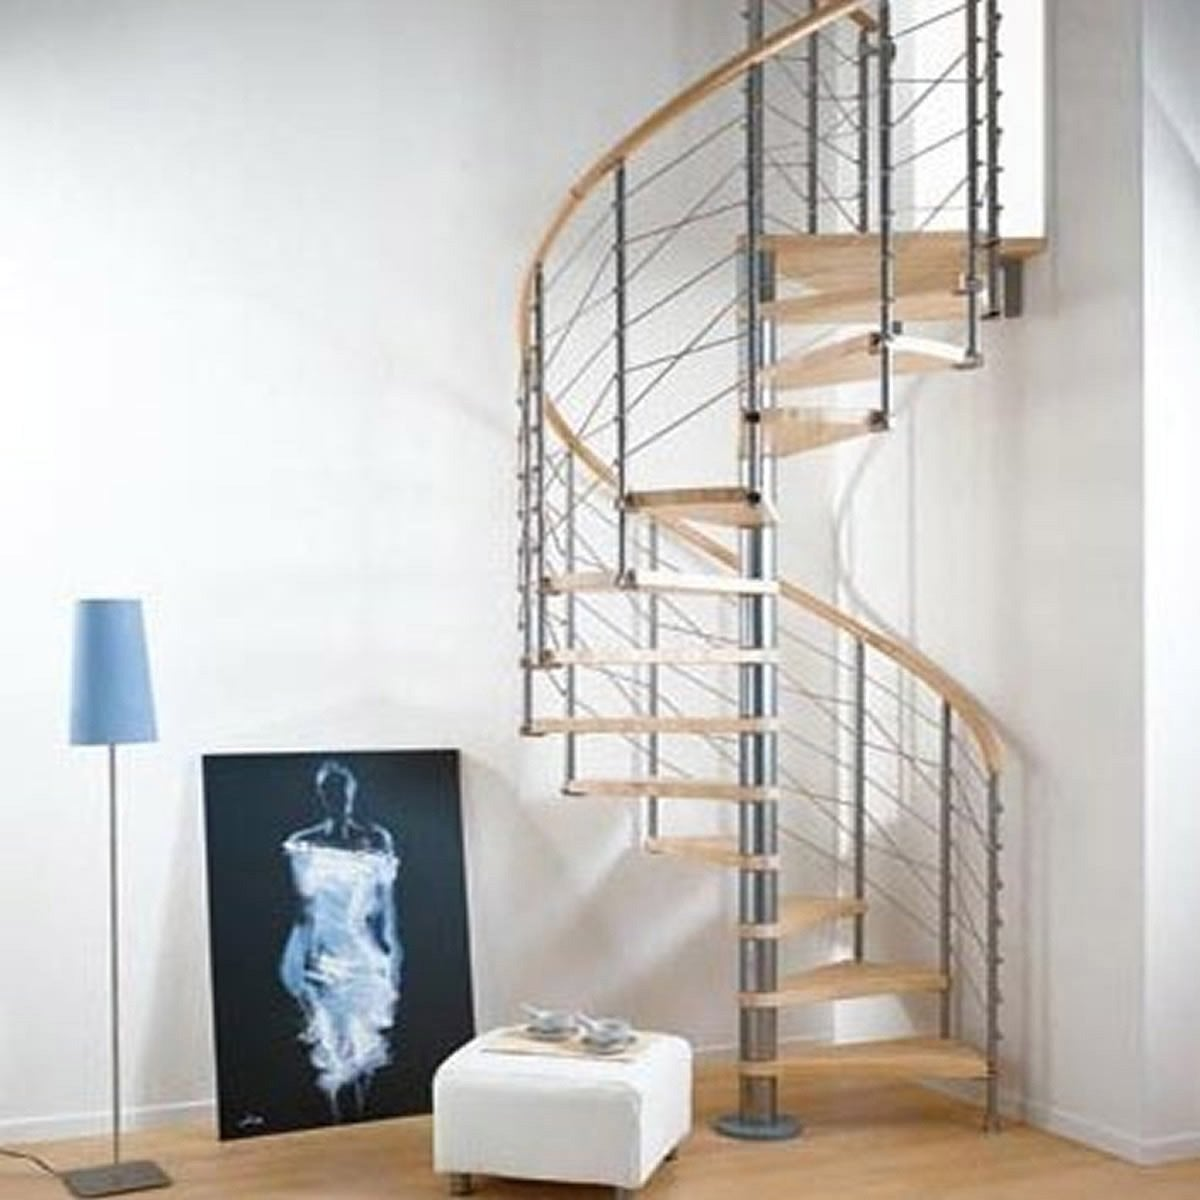 Escalier colima on rond ring structure m tal marche bois leroy merlin - Kit renovation escalier leroy merlin ...